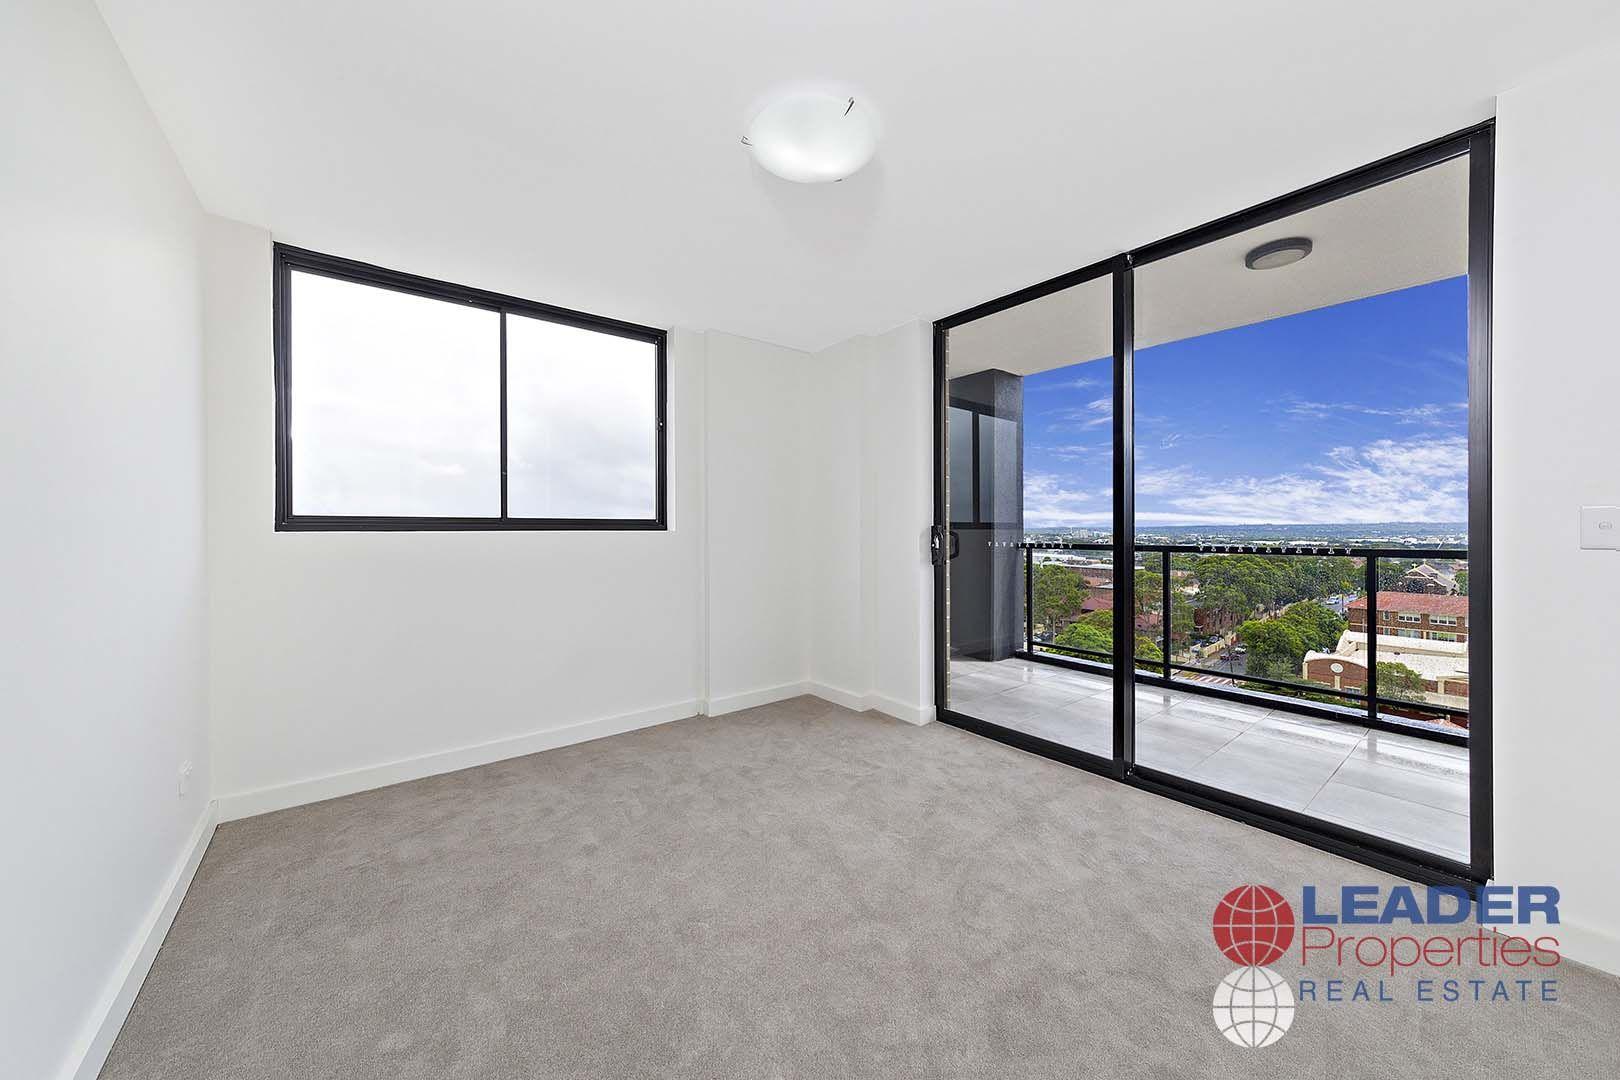 57/27-29 Mary Street, Auburn NSW 2144, Image 0